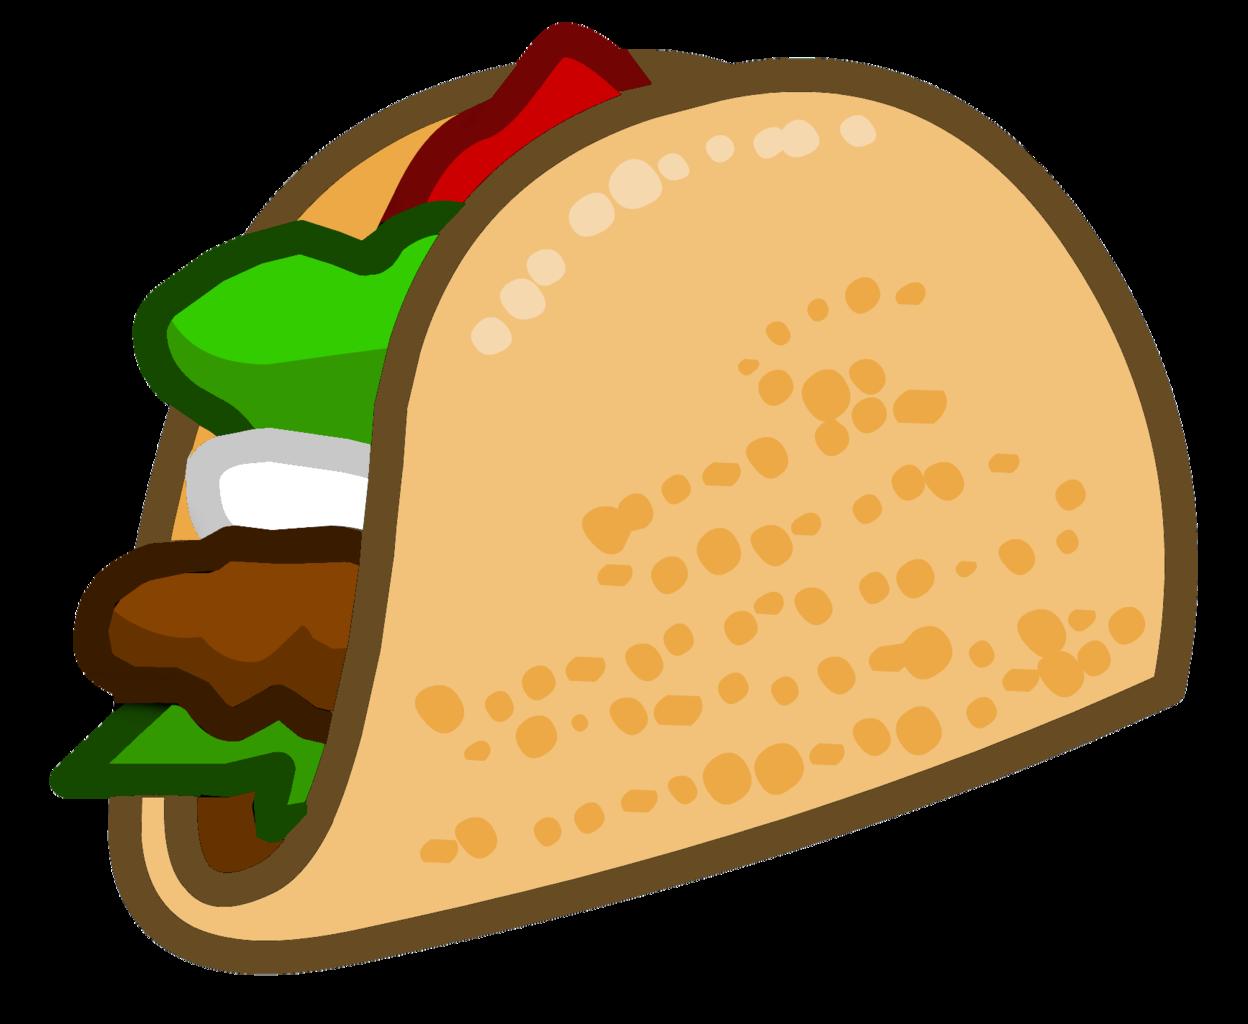 Image taco mexino icon. Tacos clipart comic